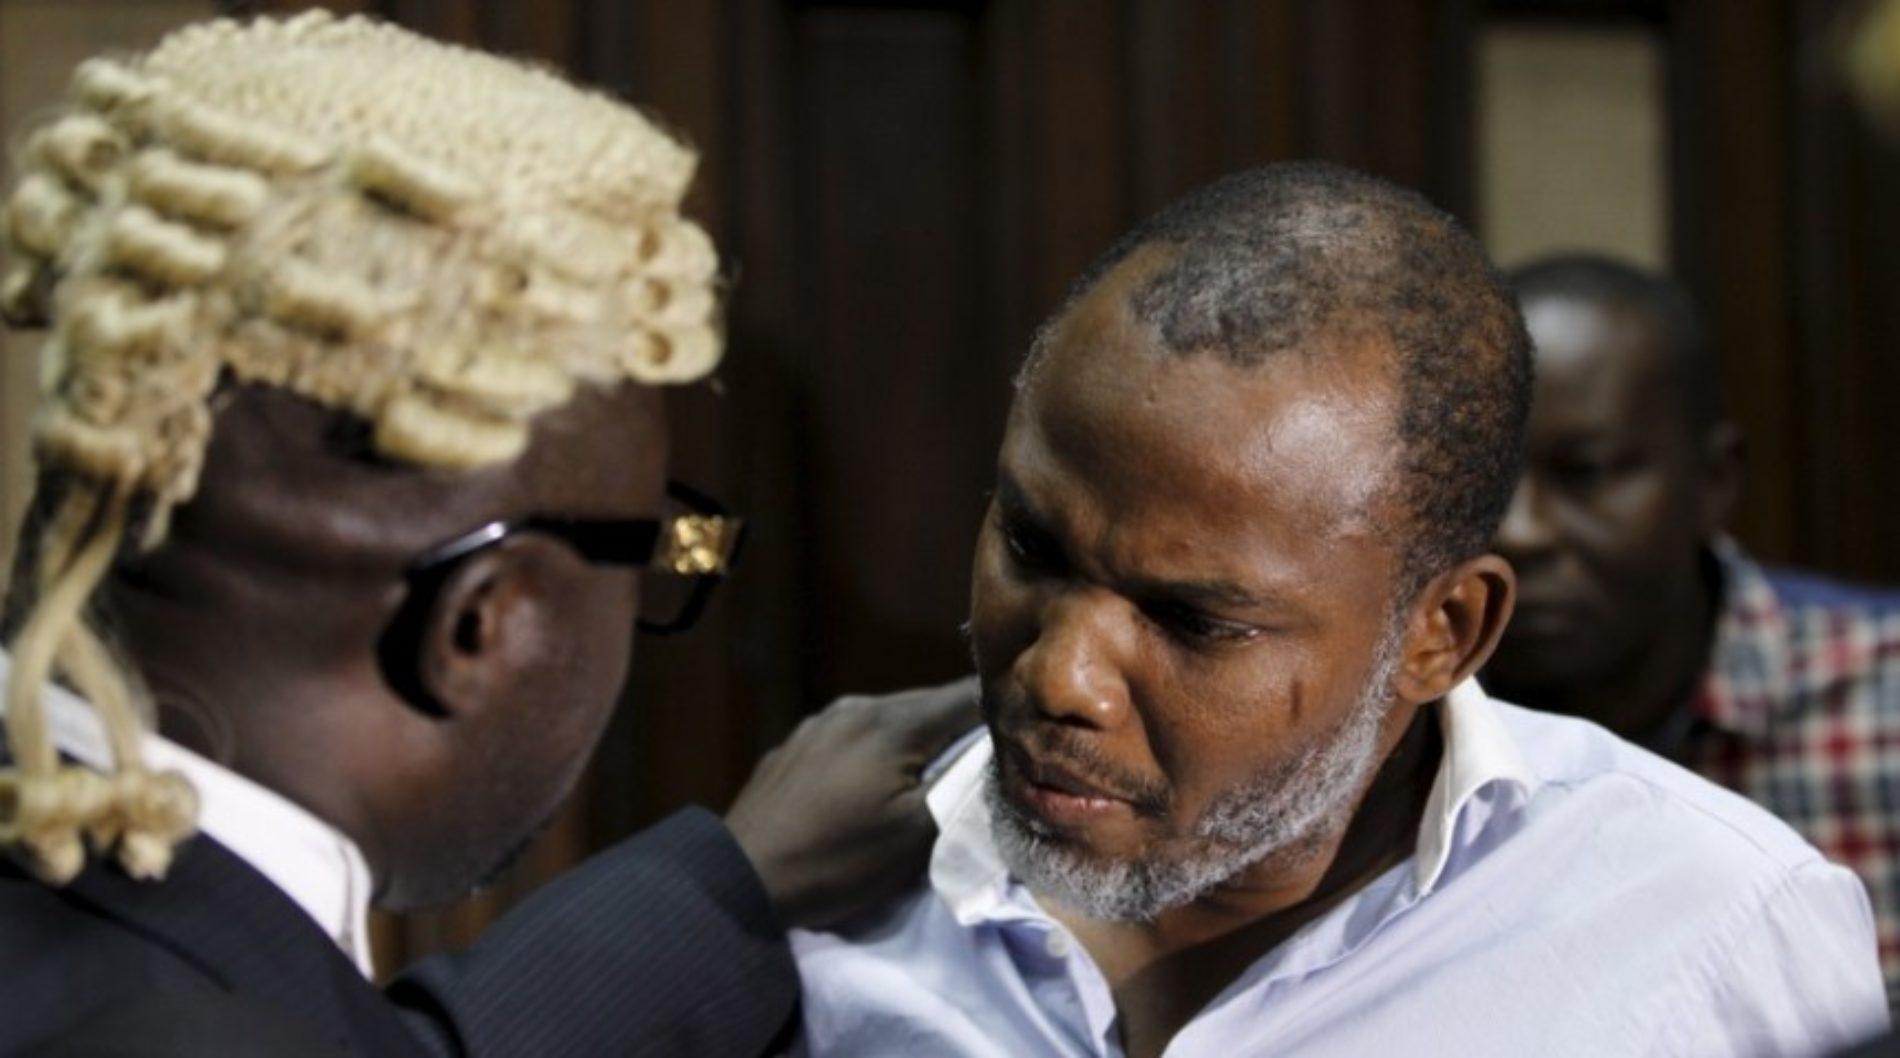 The Nightmare of Nigeria's Homophobia Still Thrives